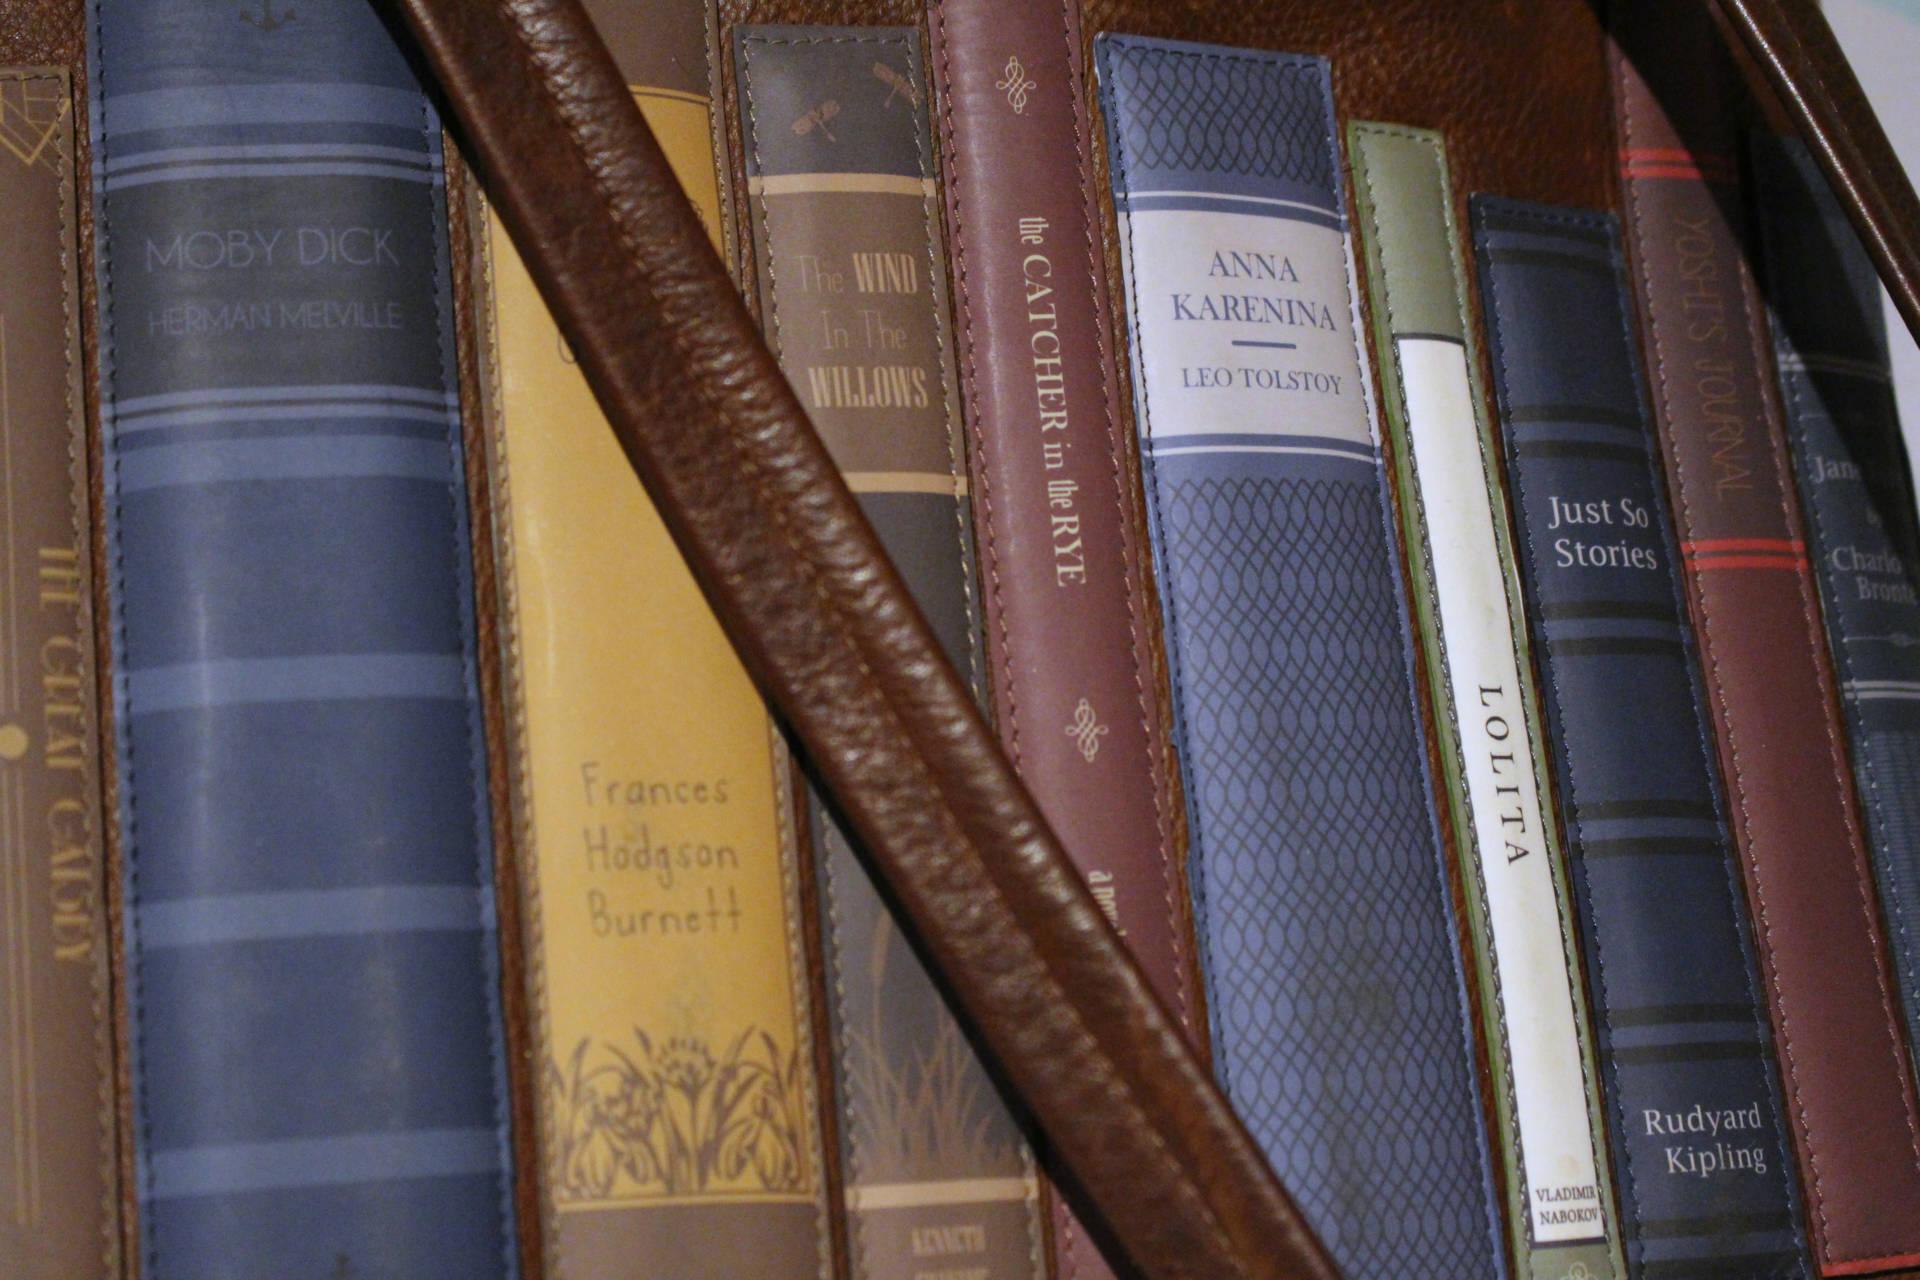 yoshi-lichfield-bag-bookworm-leather-bag